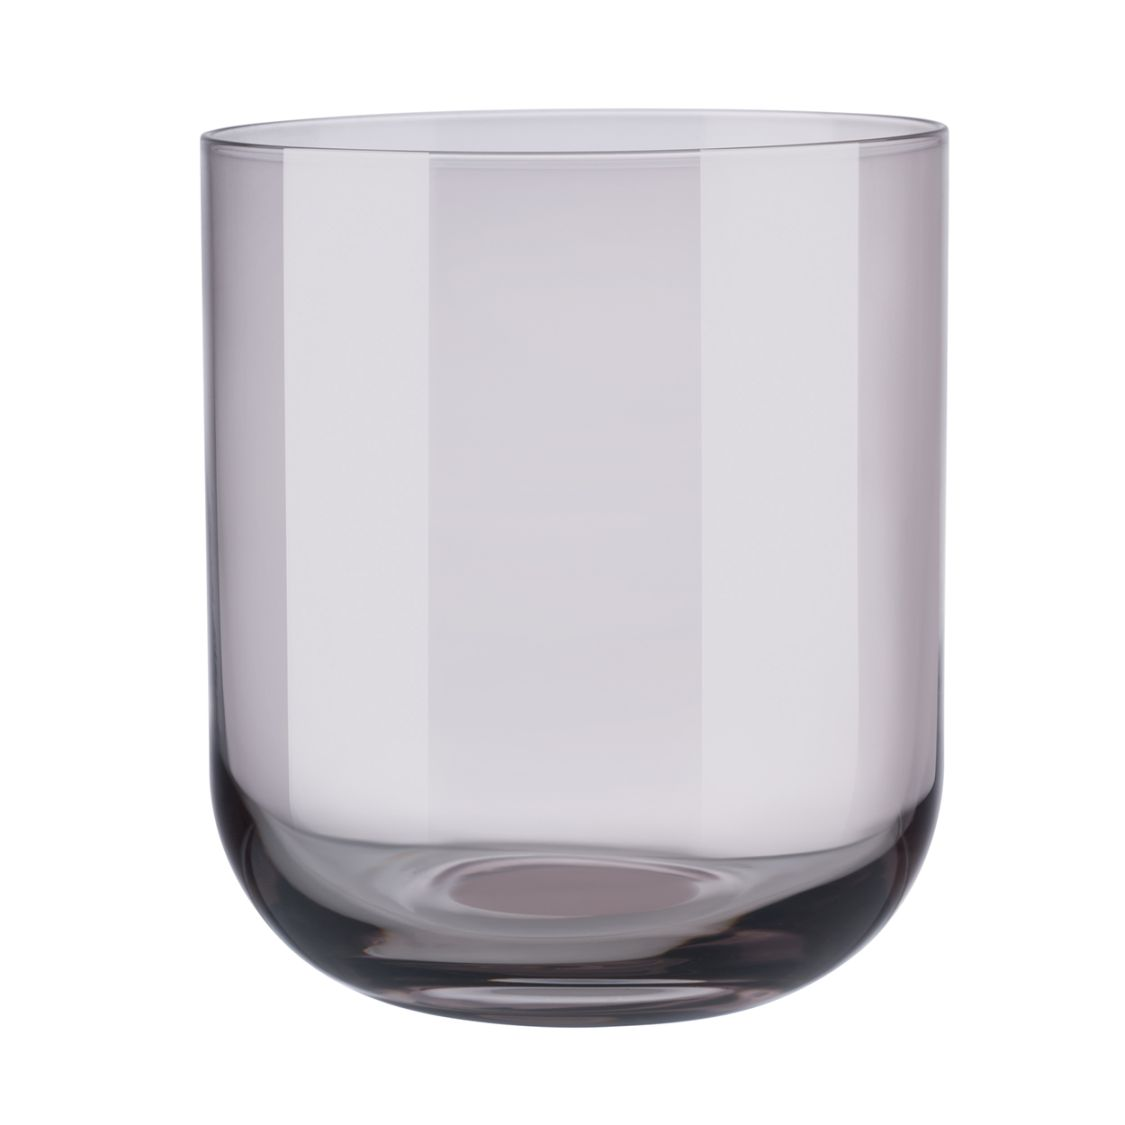 Sada sklenic FUUM 4ks, hnědofialová - Blomus